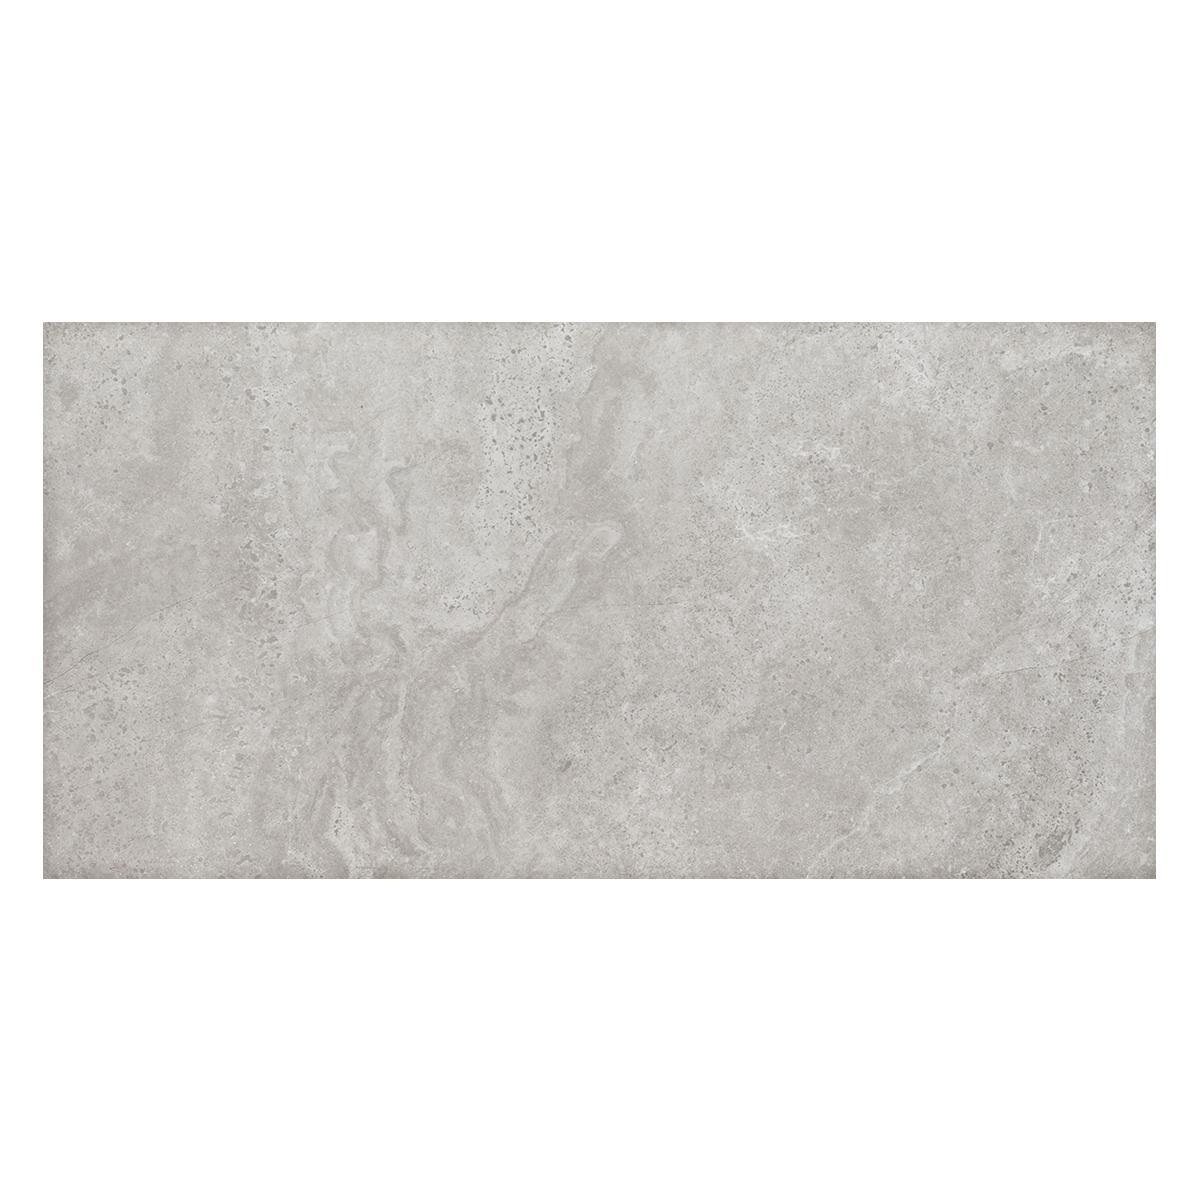 Porcelanato Dolme Gris Brillante - 59.4X118.2 cm - 1.39 m2